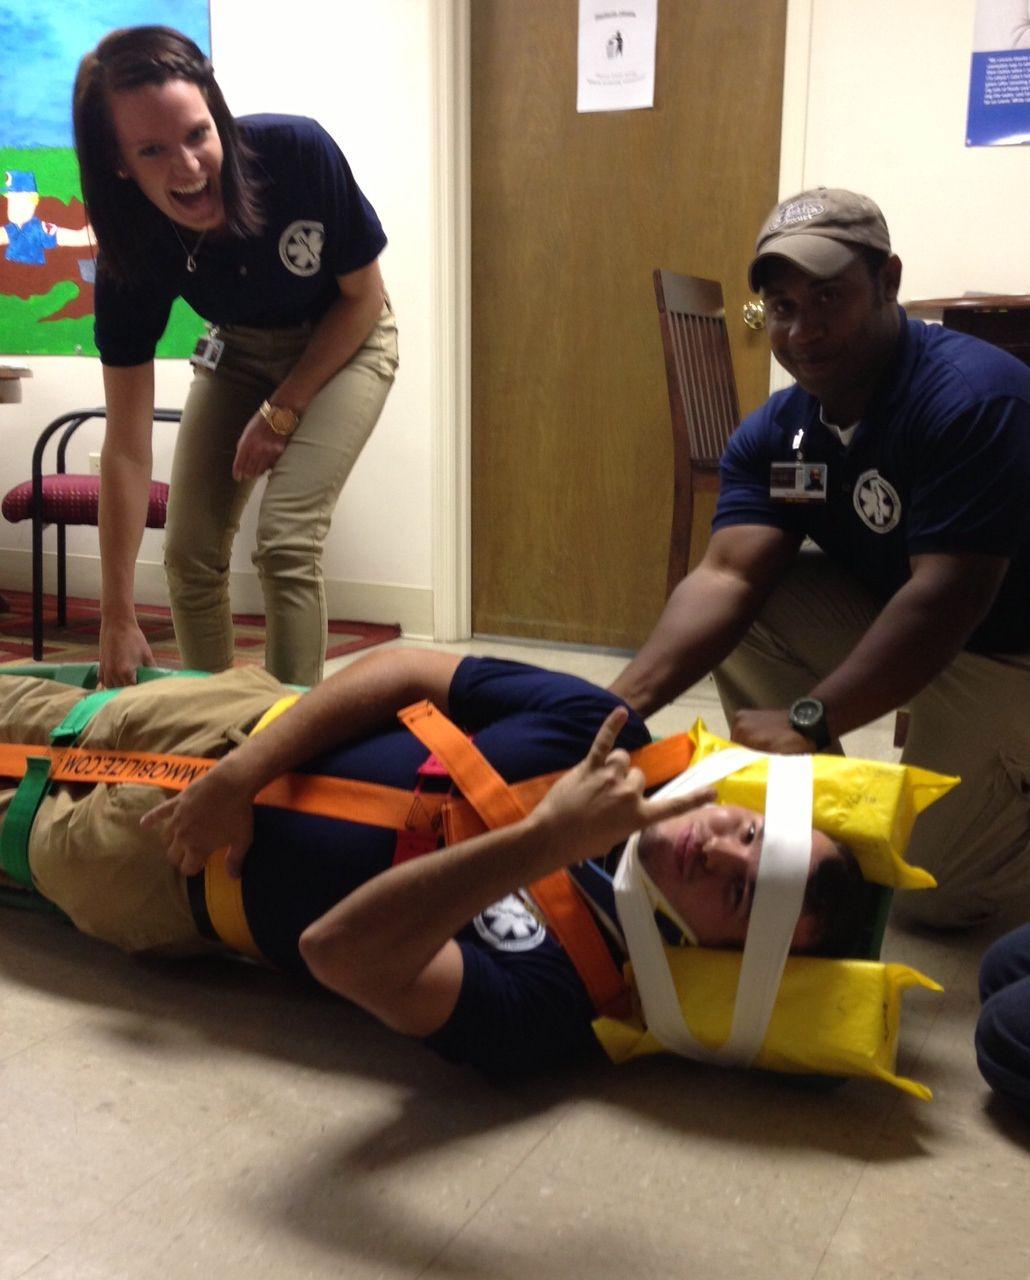 EMT EMS paramedic nremt firstresponder